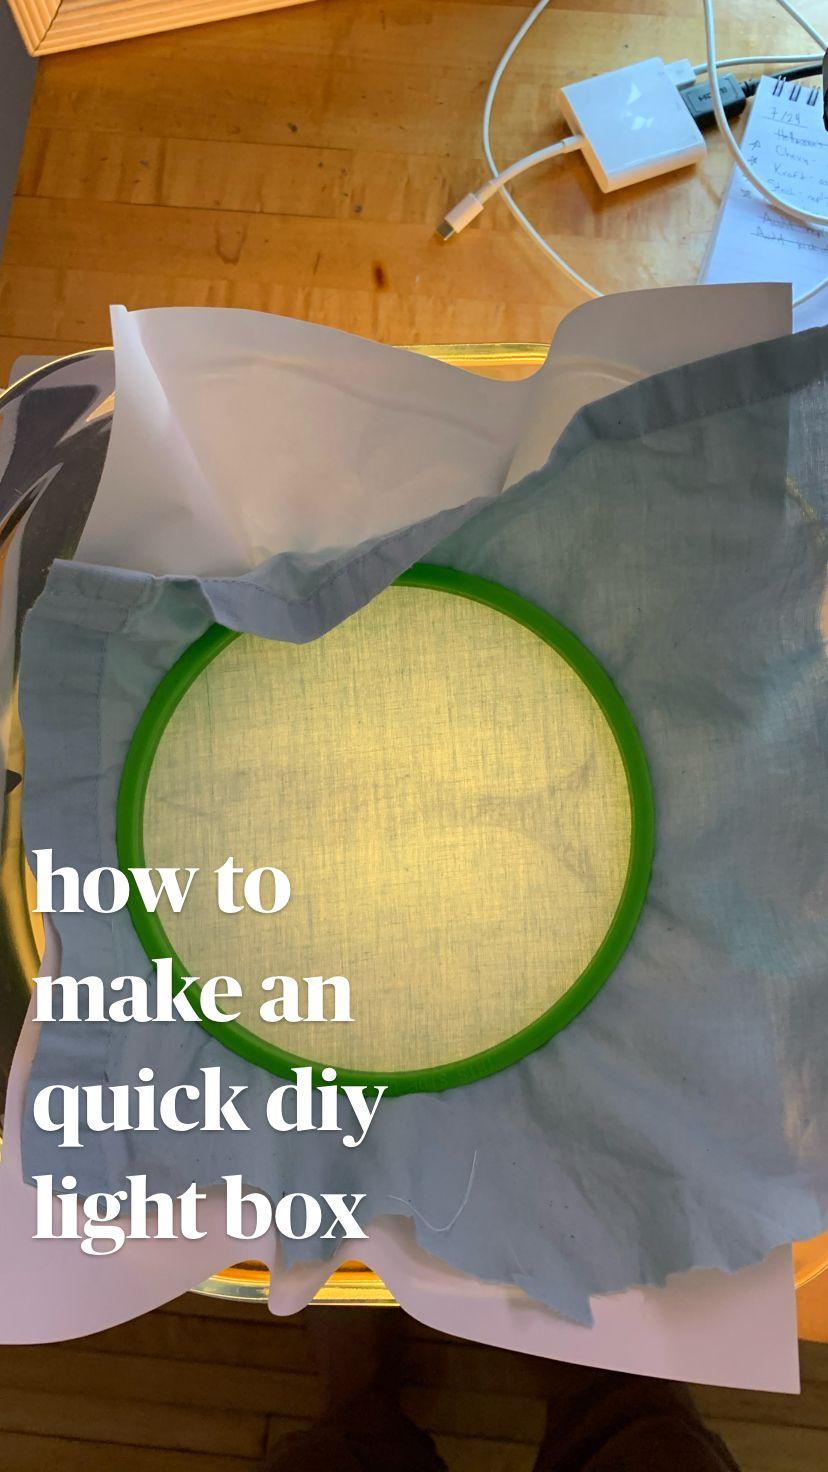 how to  make an quick diy  light box